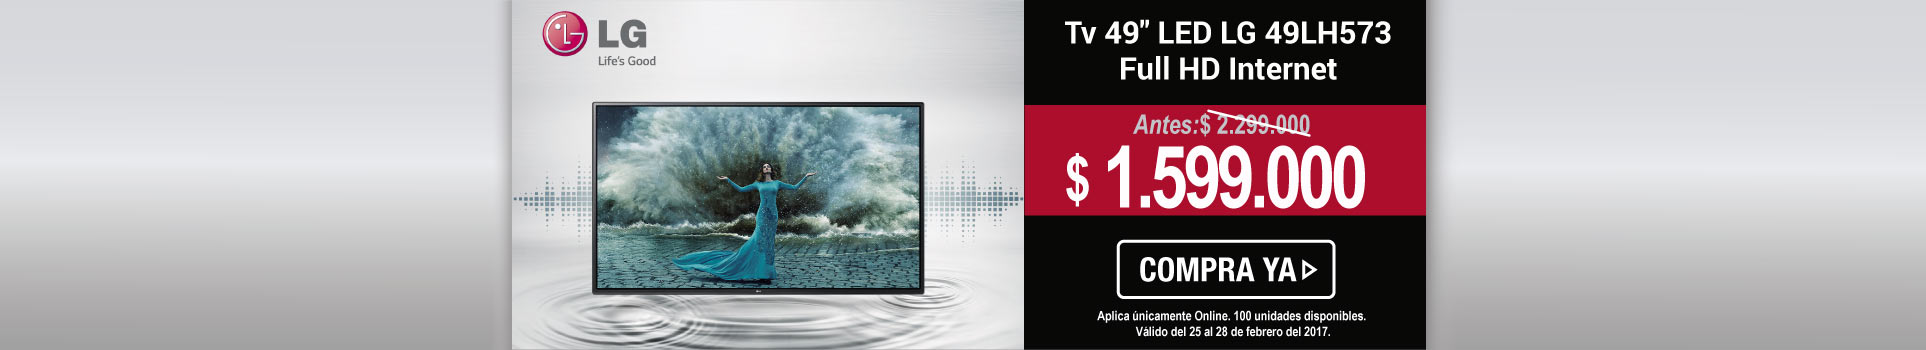 Tv 49 123 cm LED LG 49LH573 Full HD Internet - banner principal